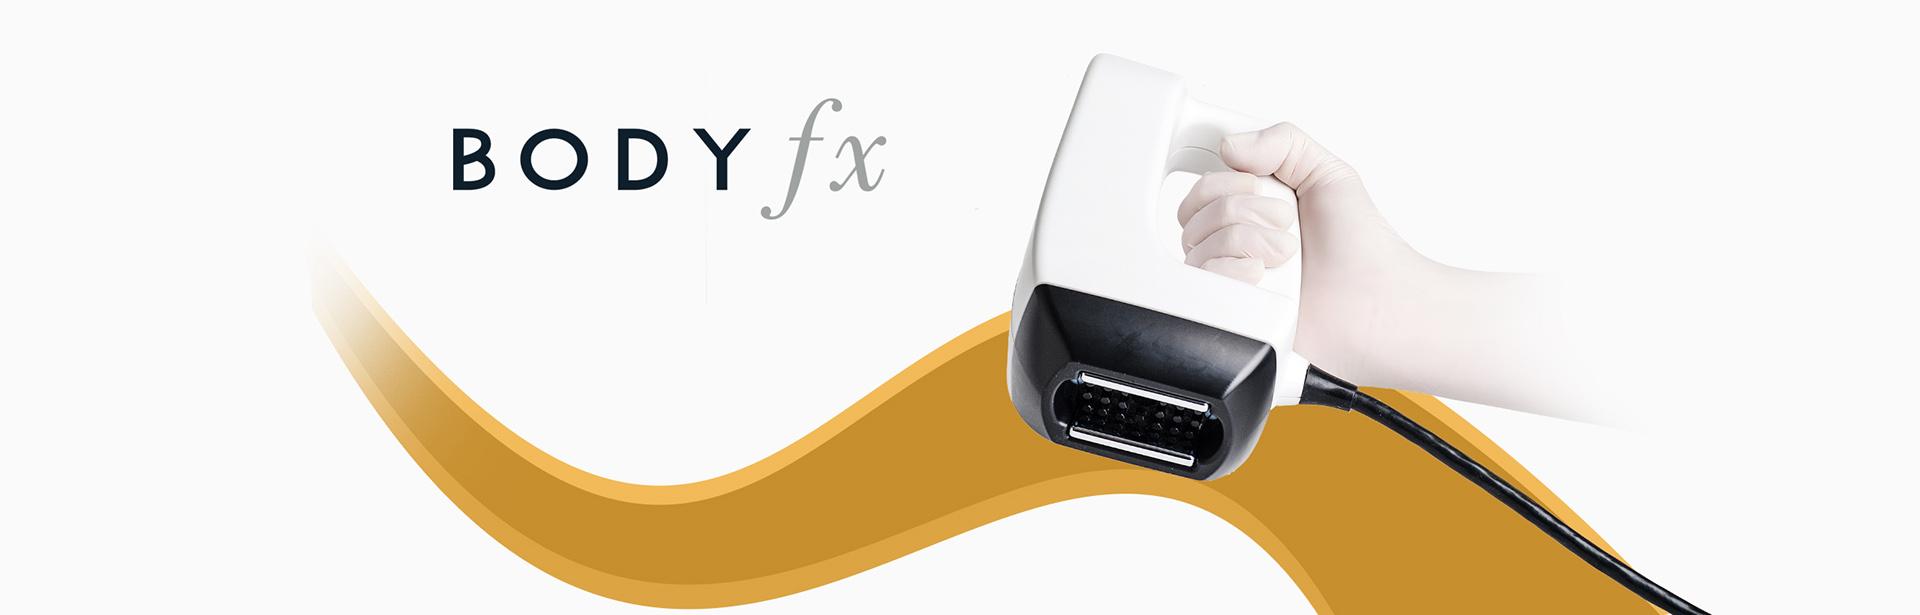 BodyFX od InMode